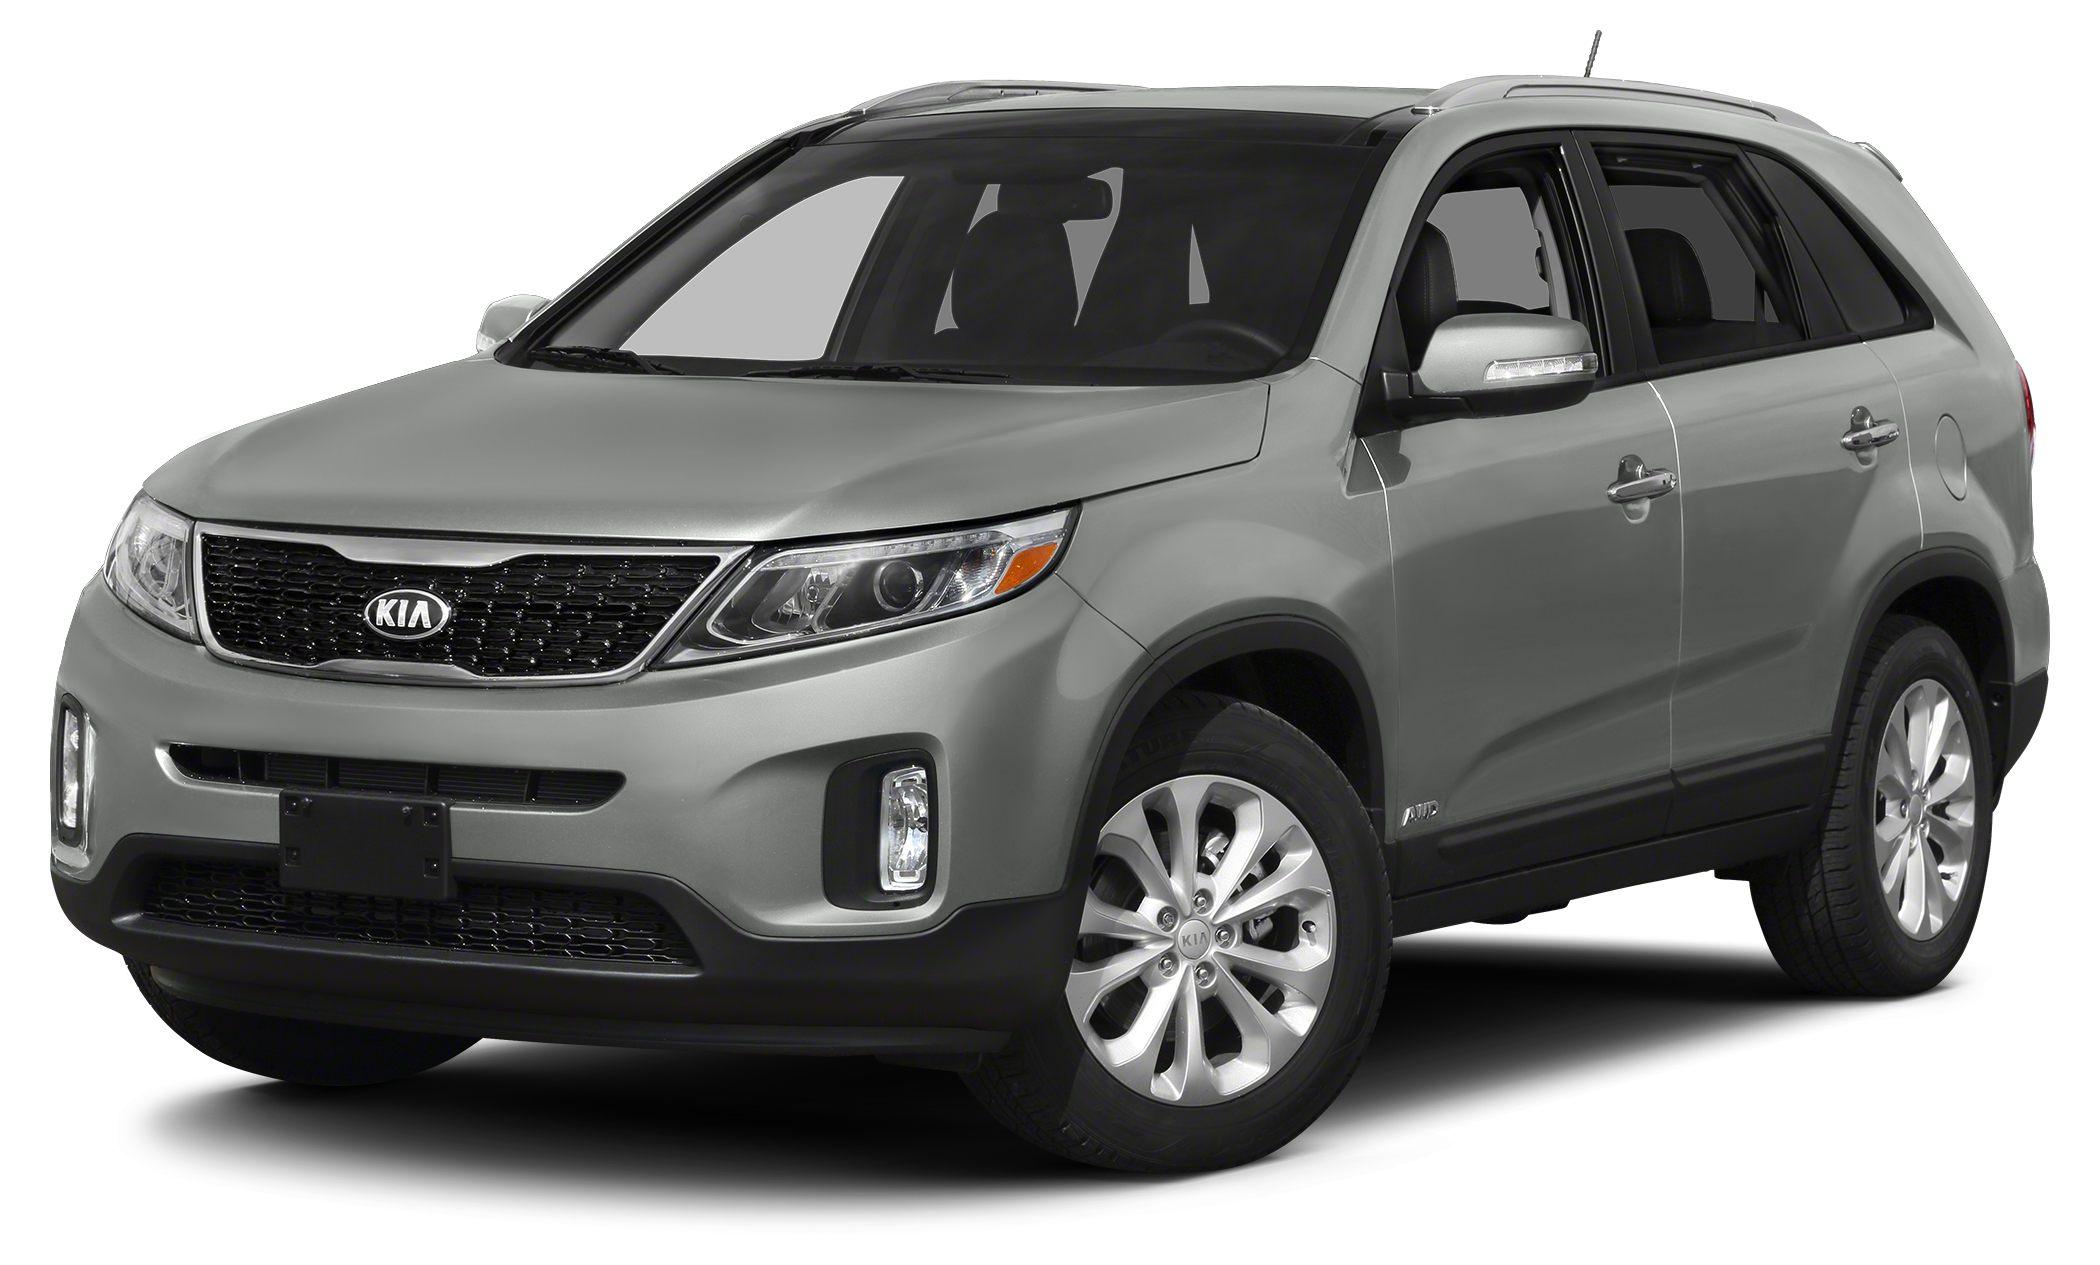 2014 Kia Sorento LX LX trim 12000 Mile Warranty EPA 26 MPG Hwy20 MPG City Bluetooth CD Playe